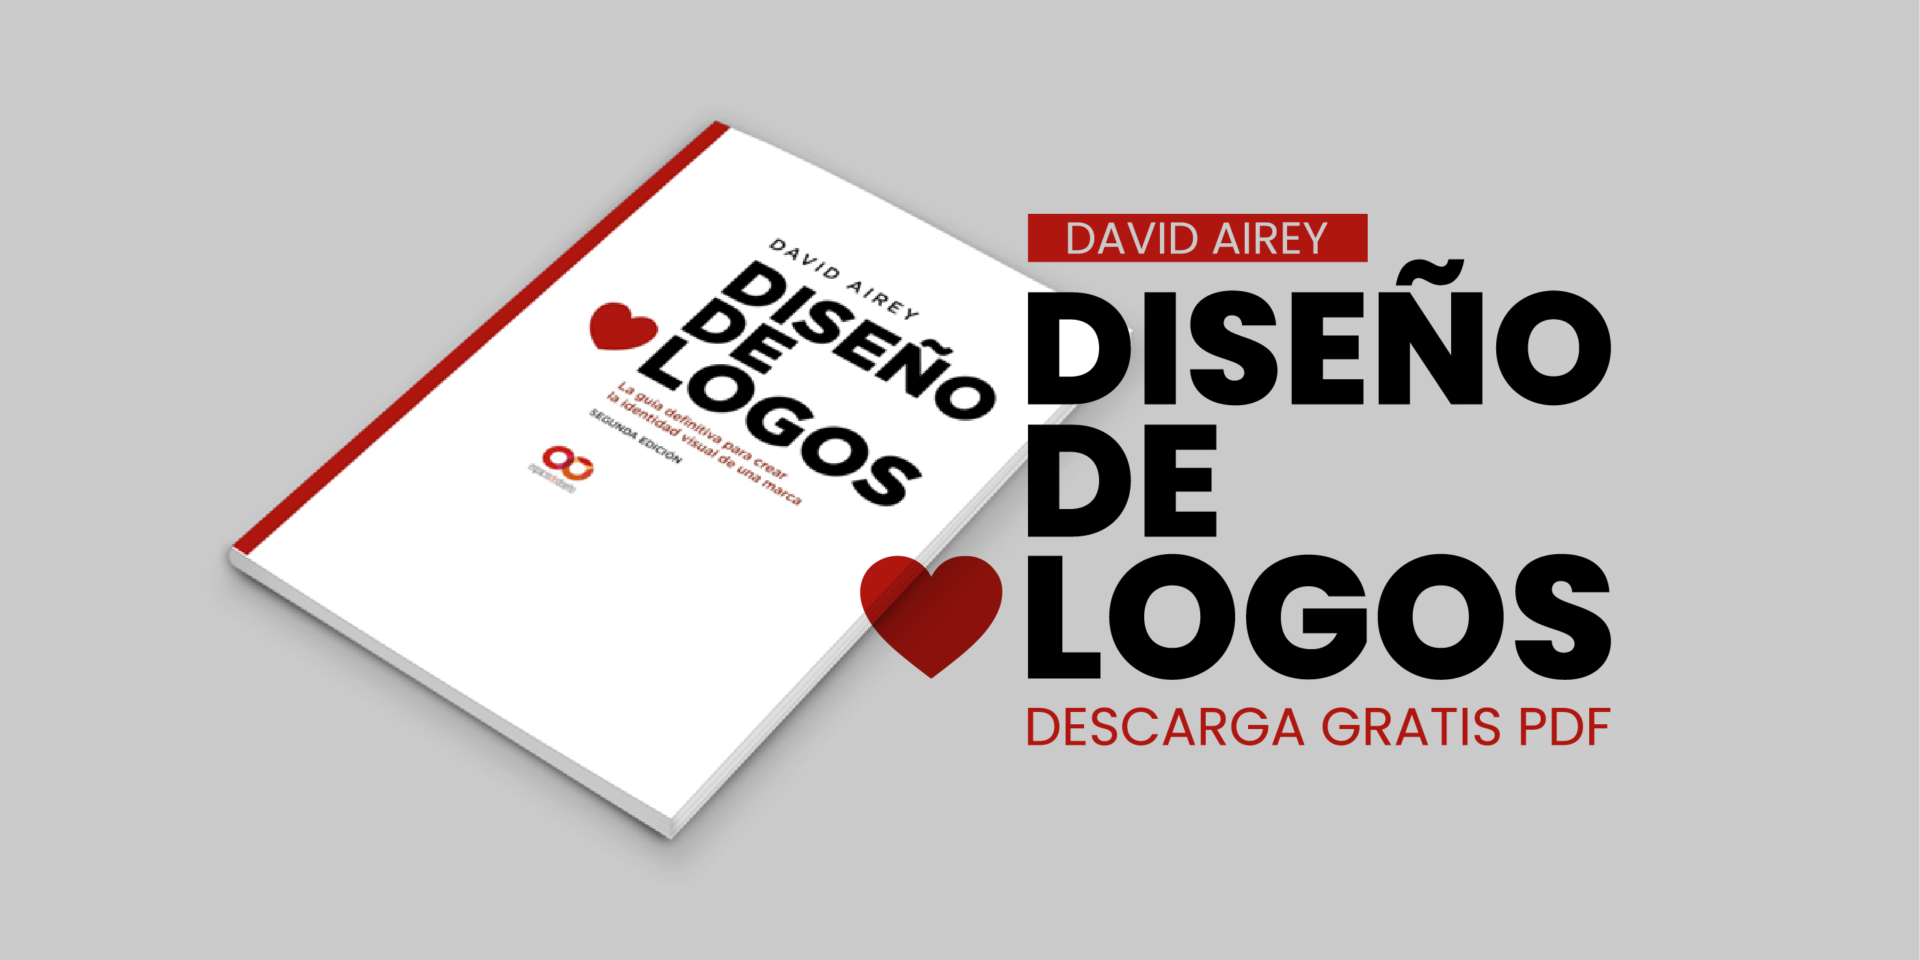 Davis Airey - Diseño de logos - Libro - español - descargar - pdf